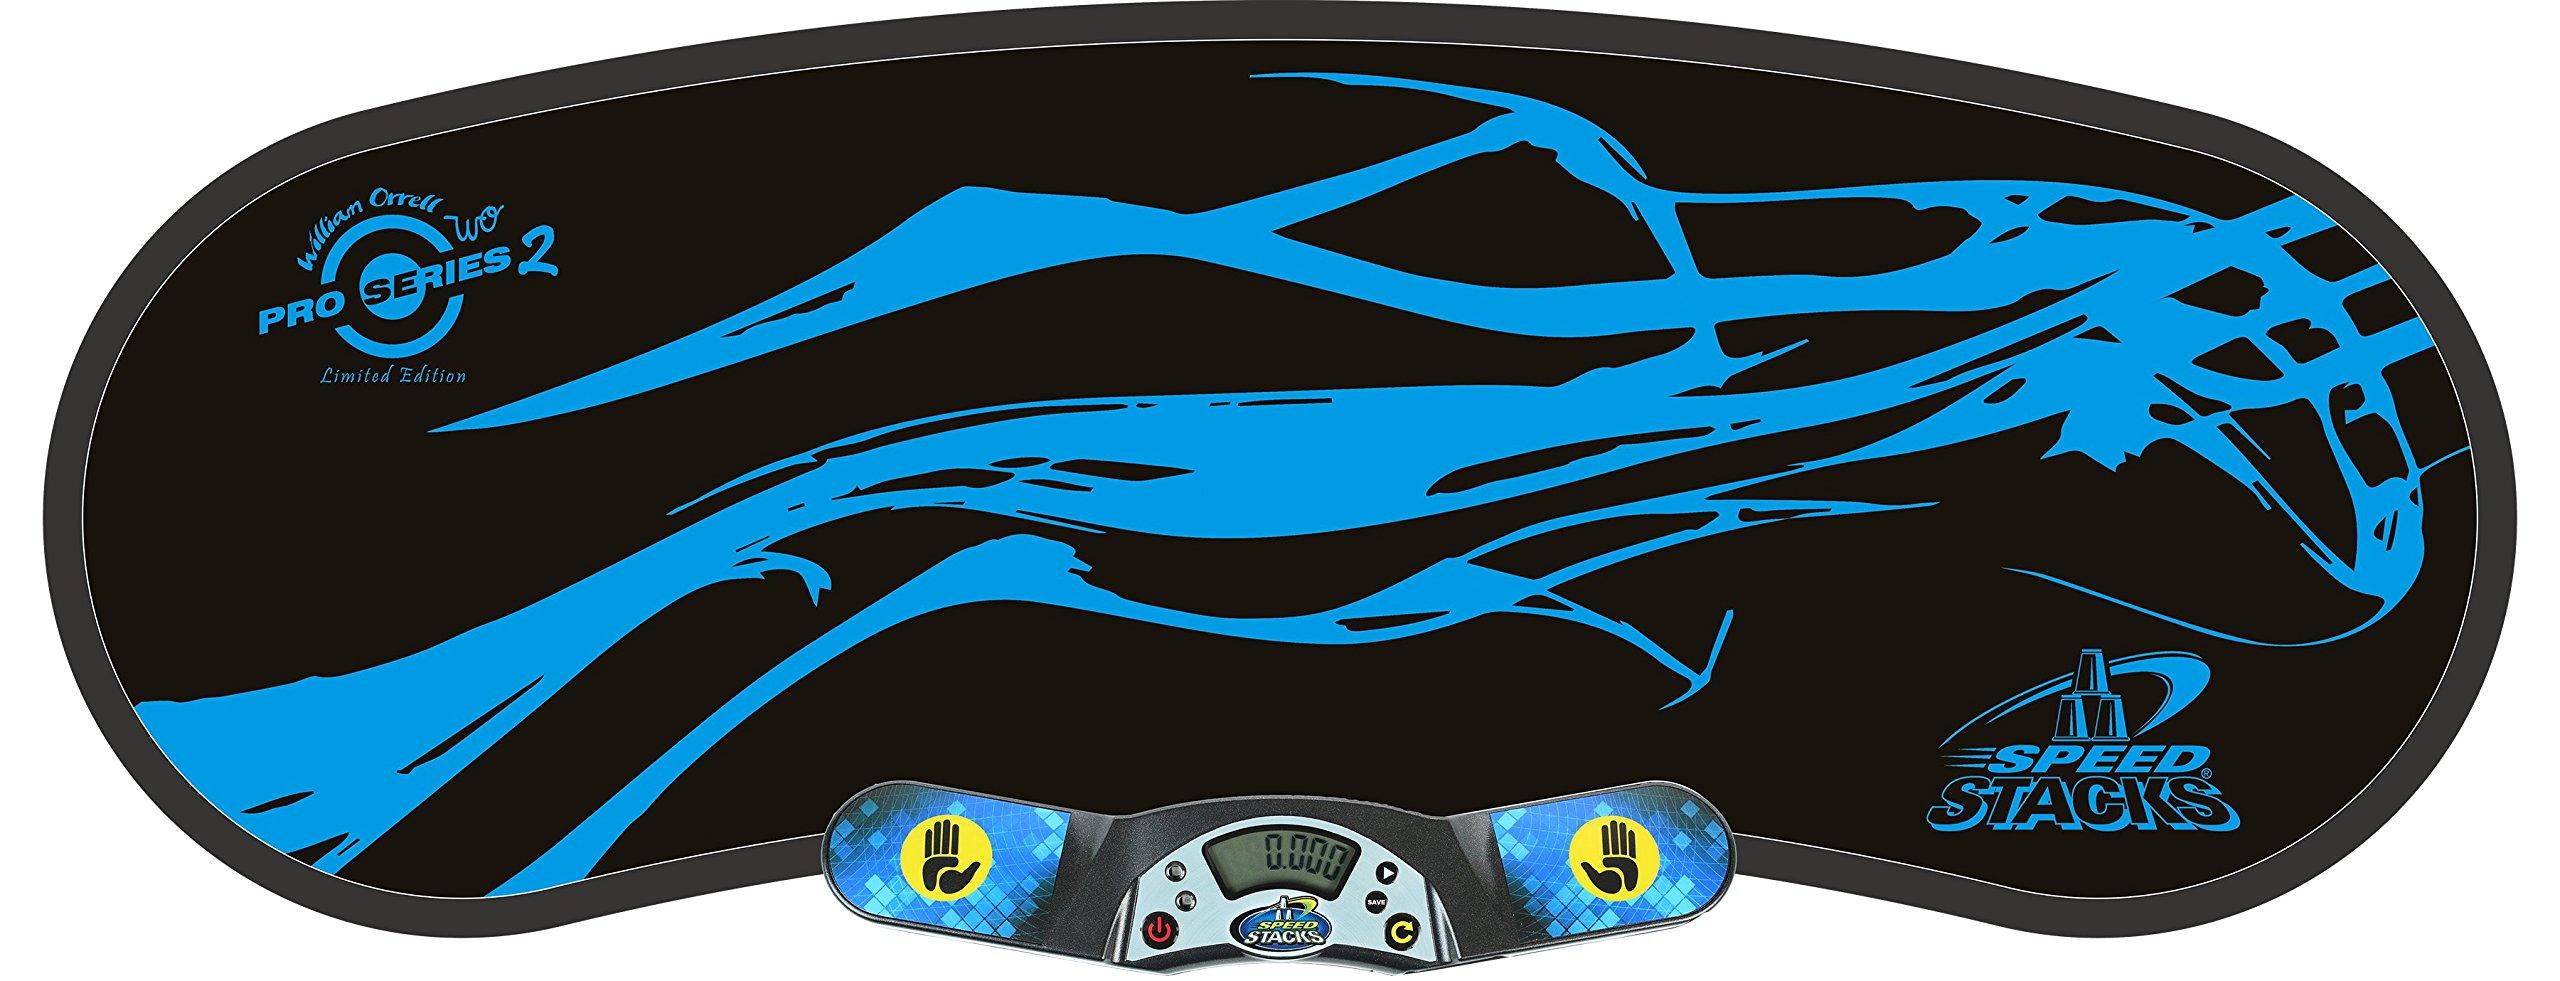 Speed Stacks G4 STACKMAT - Blue Flow